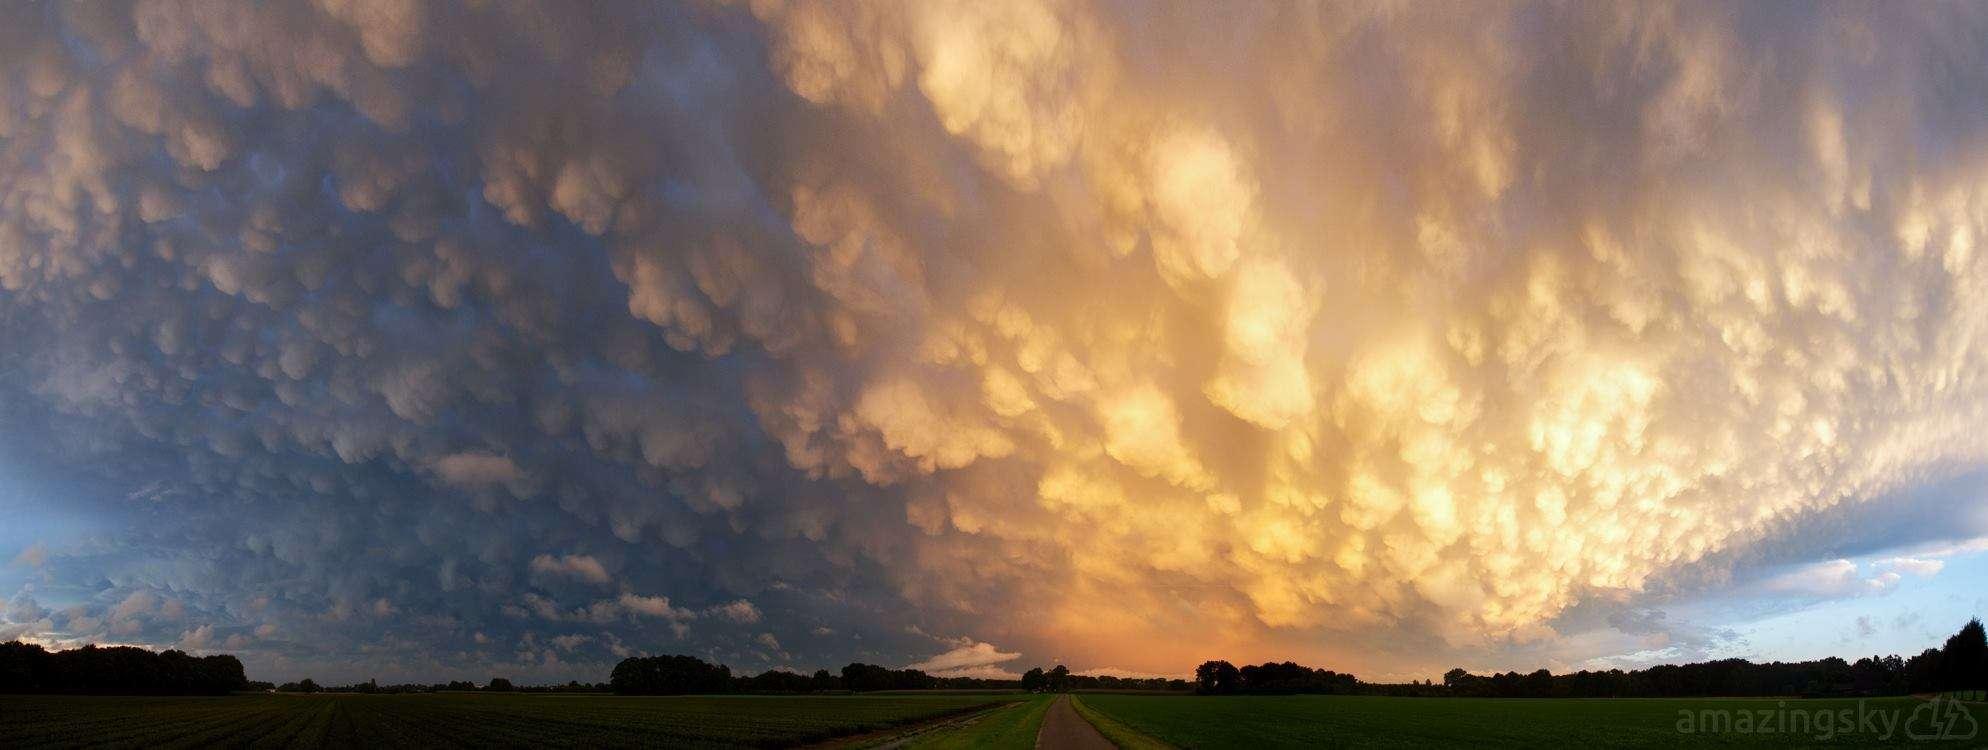 Mammatus clouds at sunset today. Zelhem, The Netherlands.